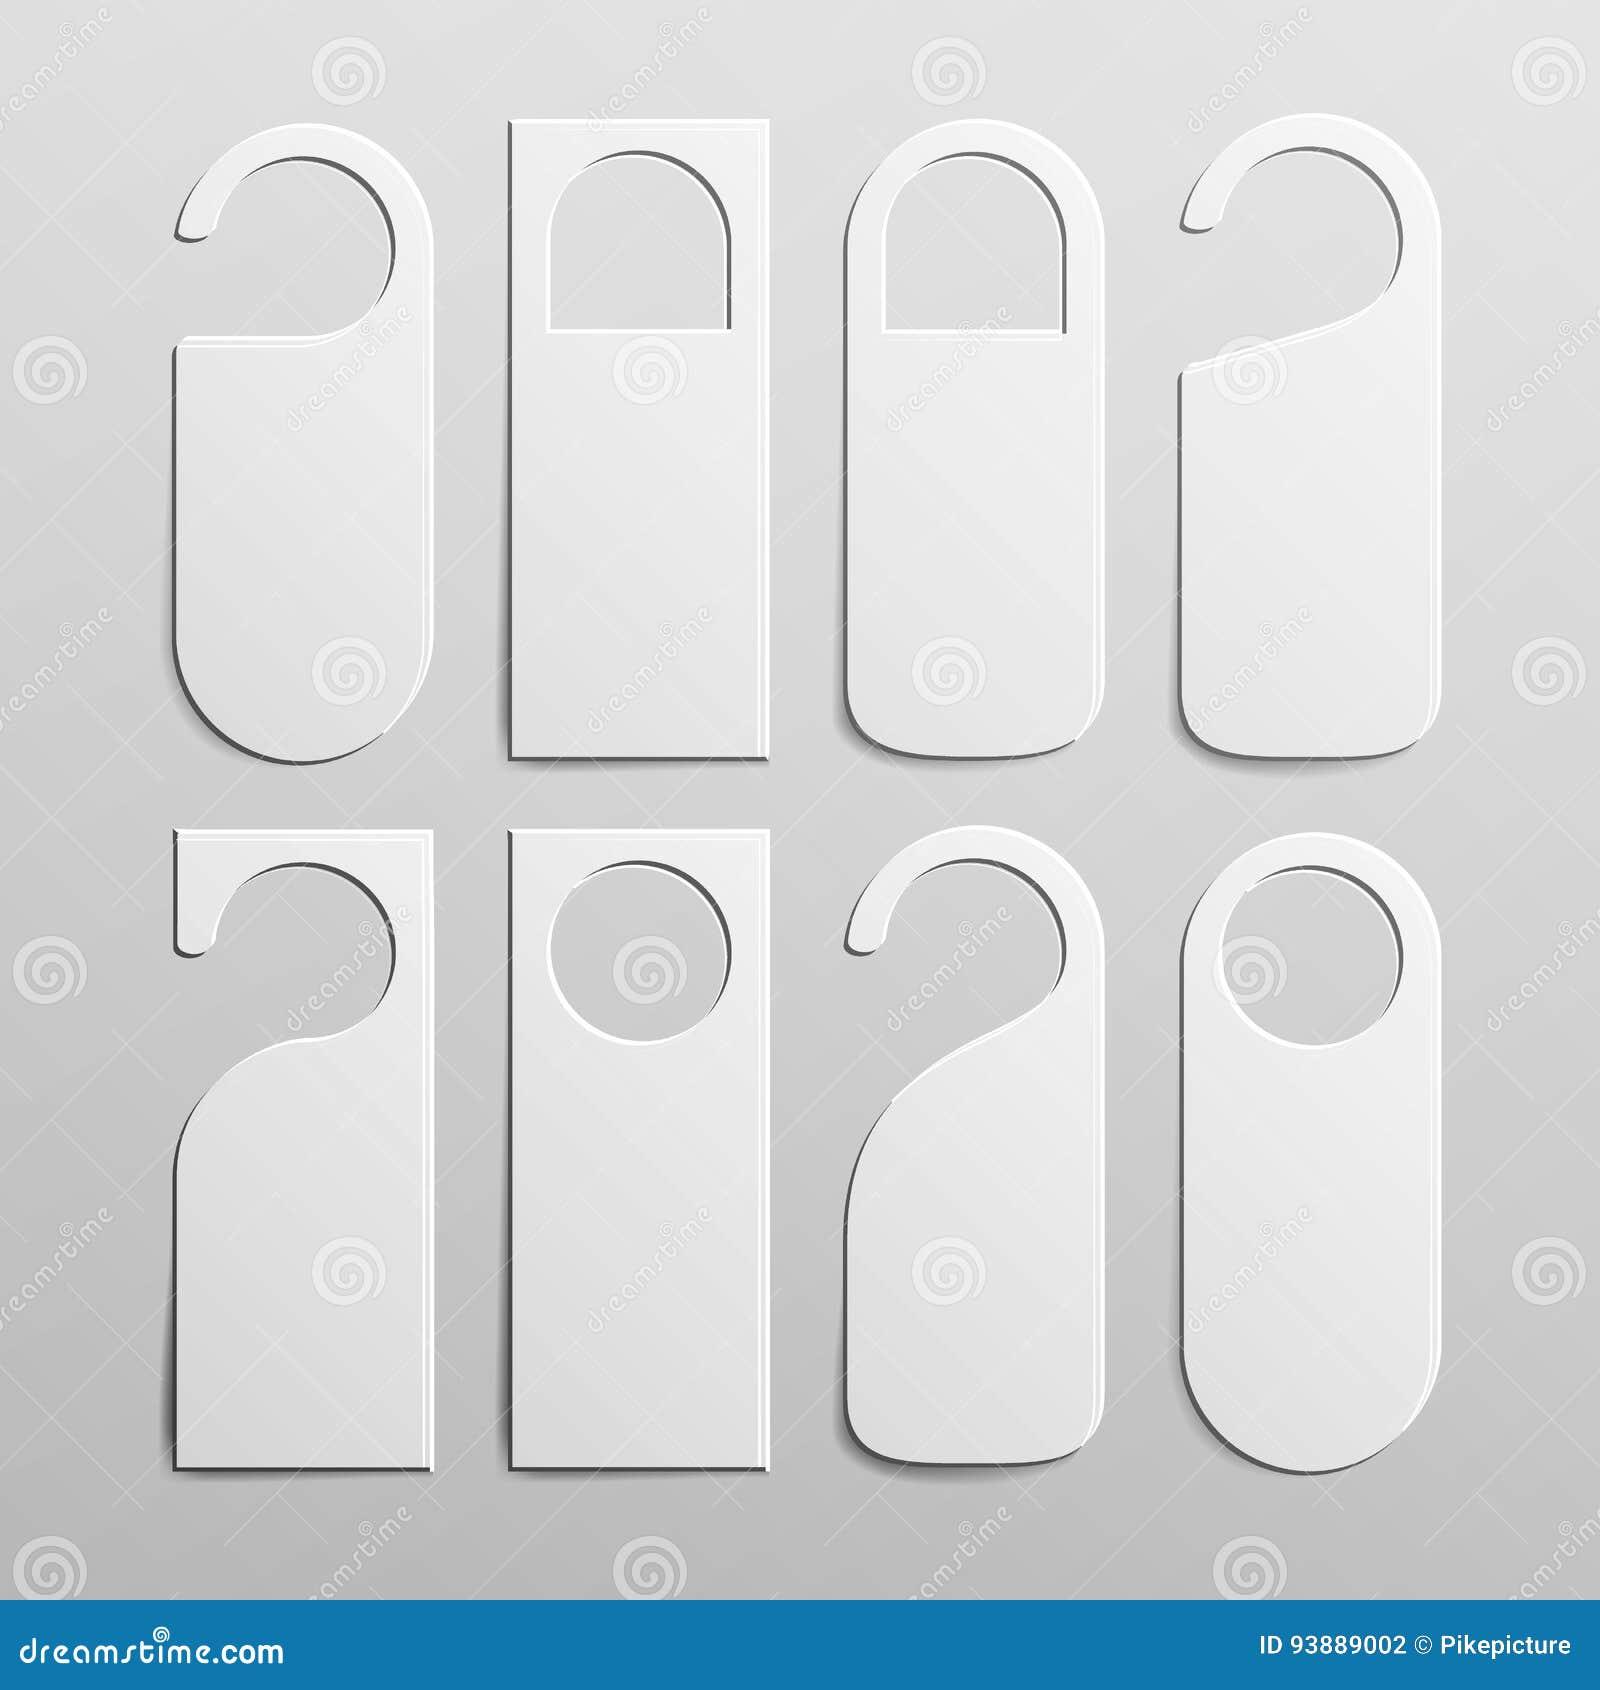 Cintres En Plastique De Papier De Serrure De Poignee De Porte Regles